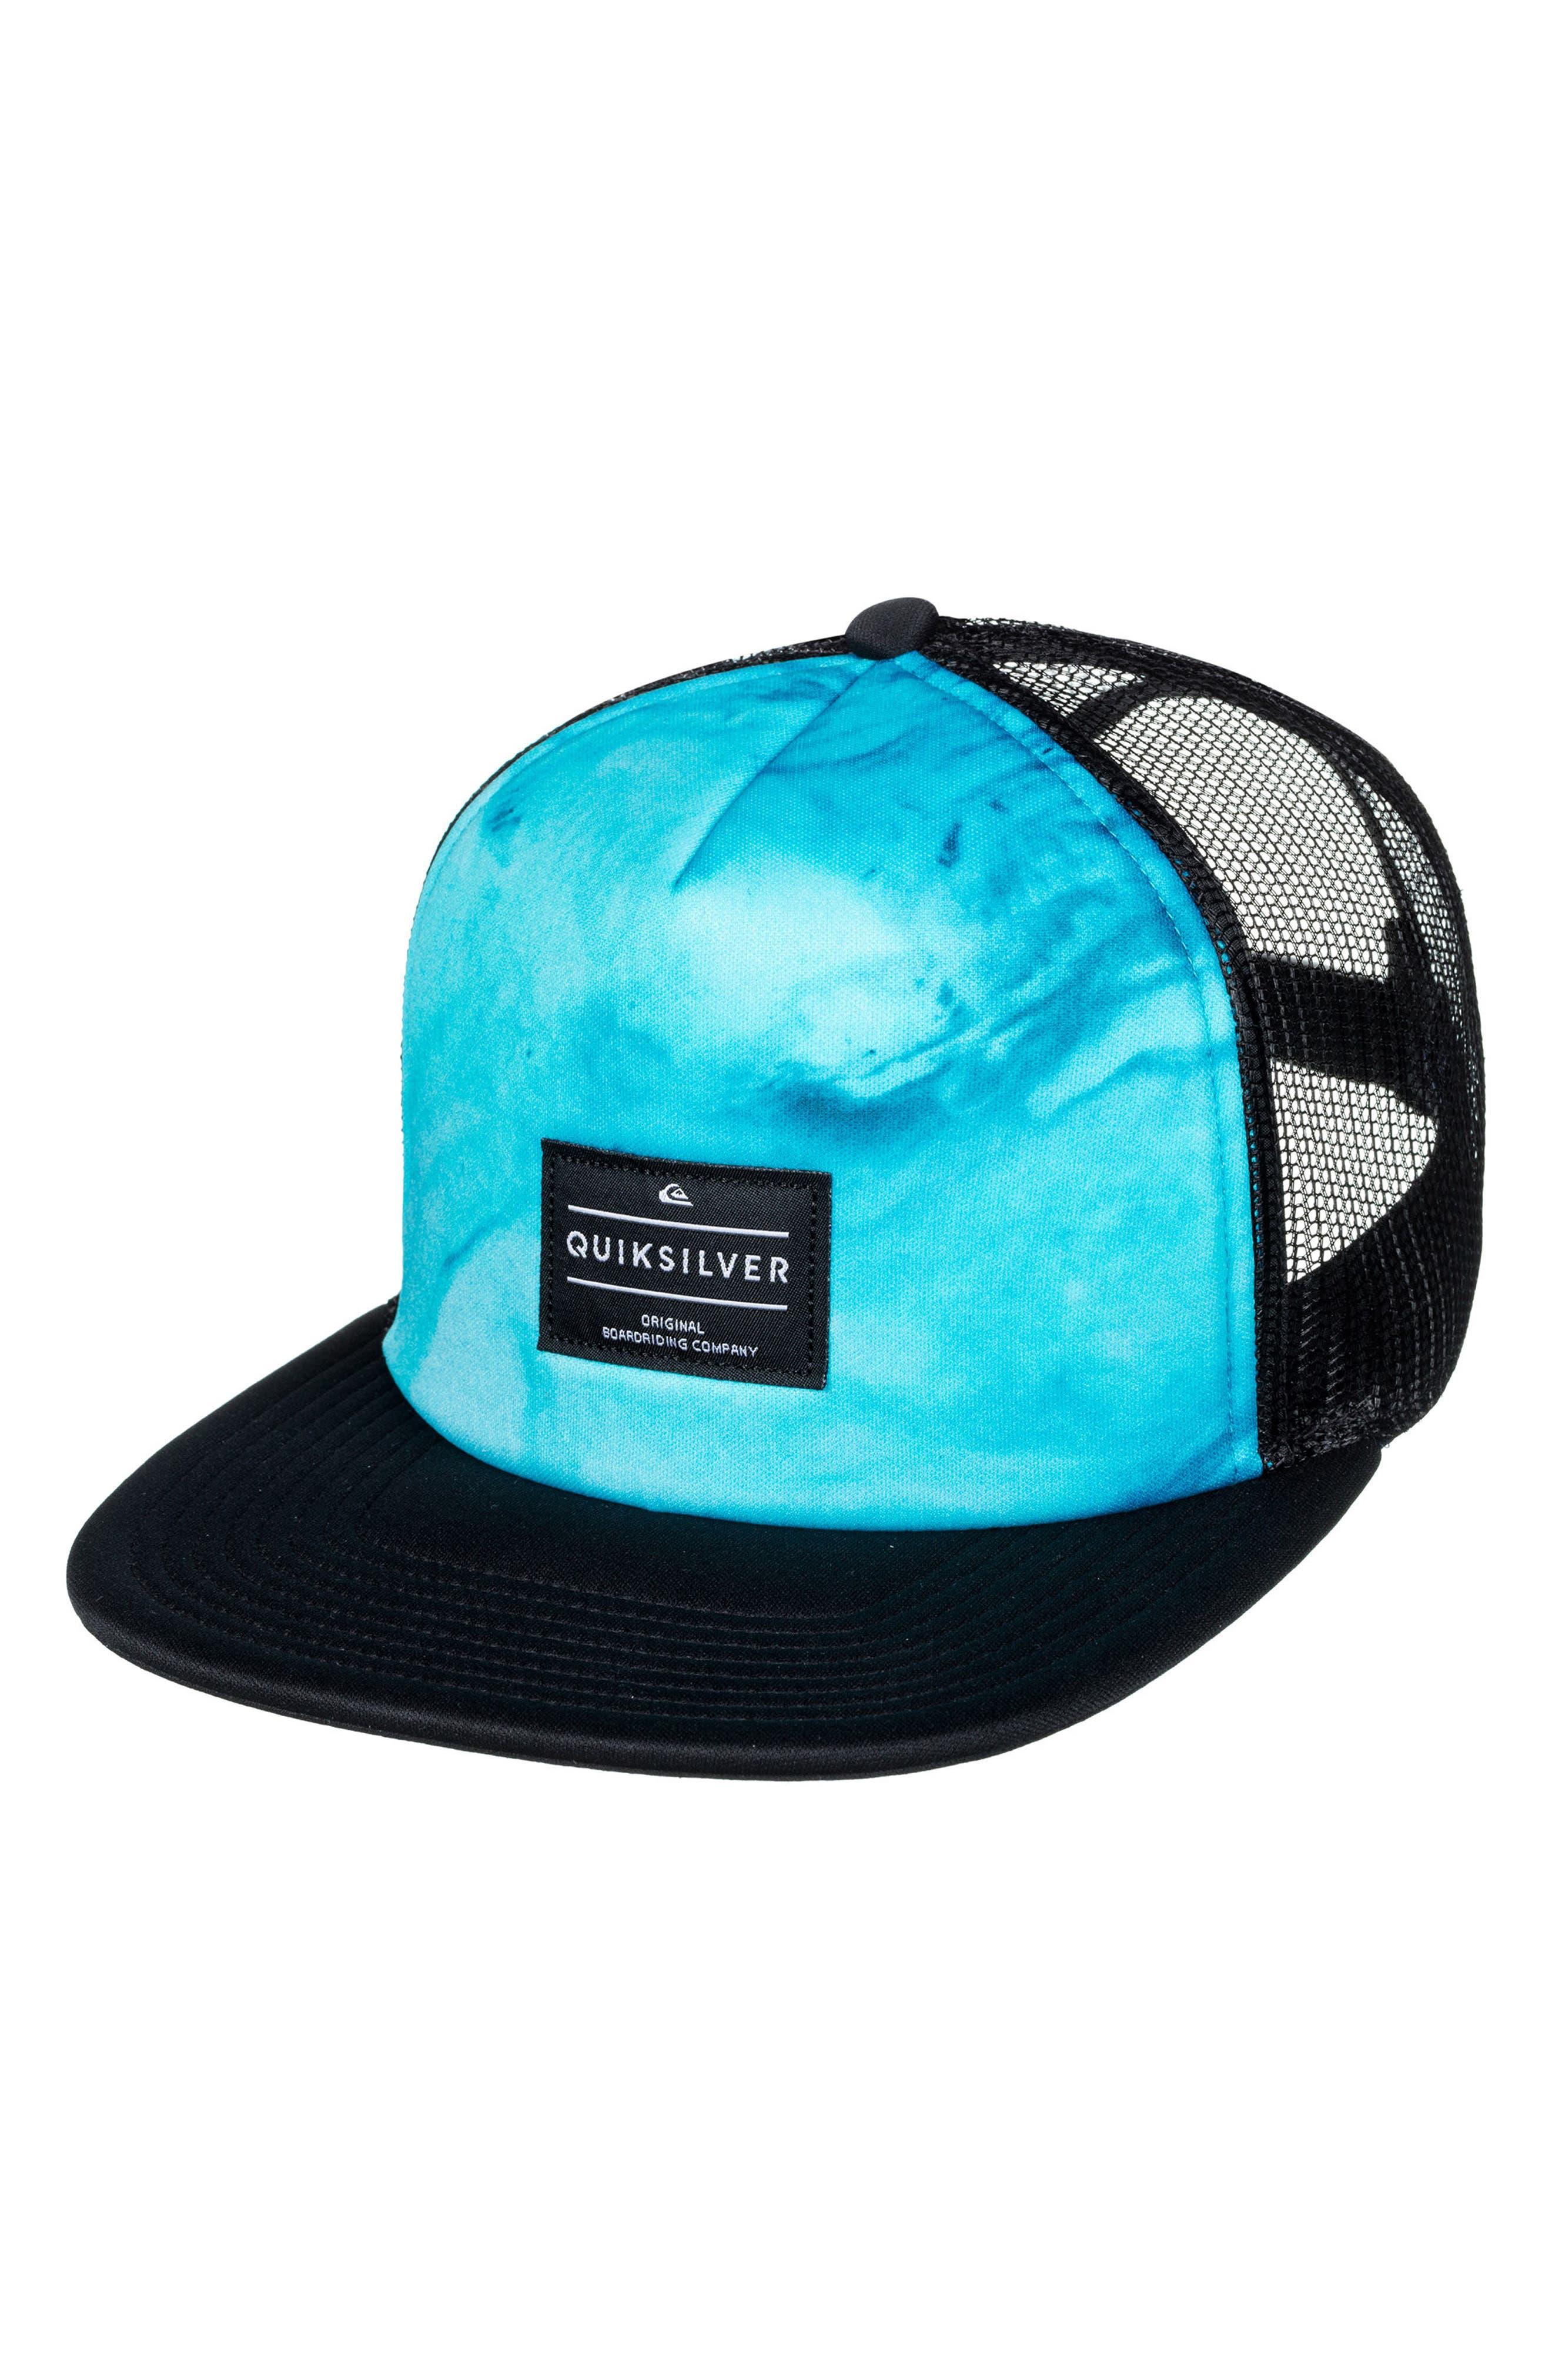 Brissells Snapback Trucker Hat,                         Main,                         color, 002